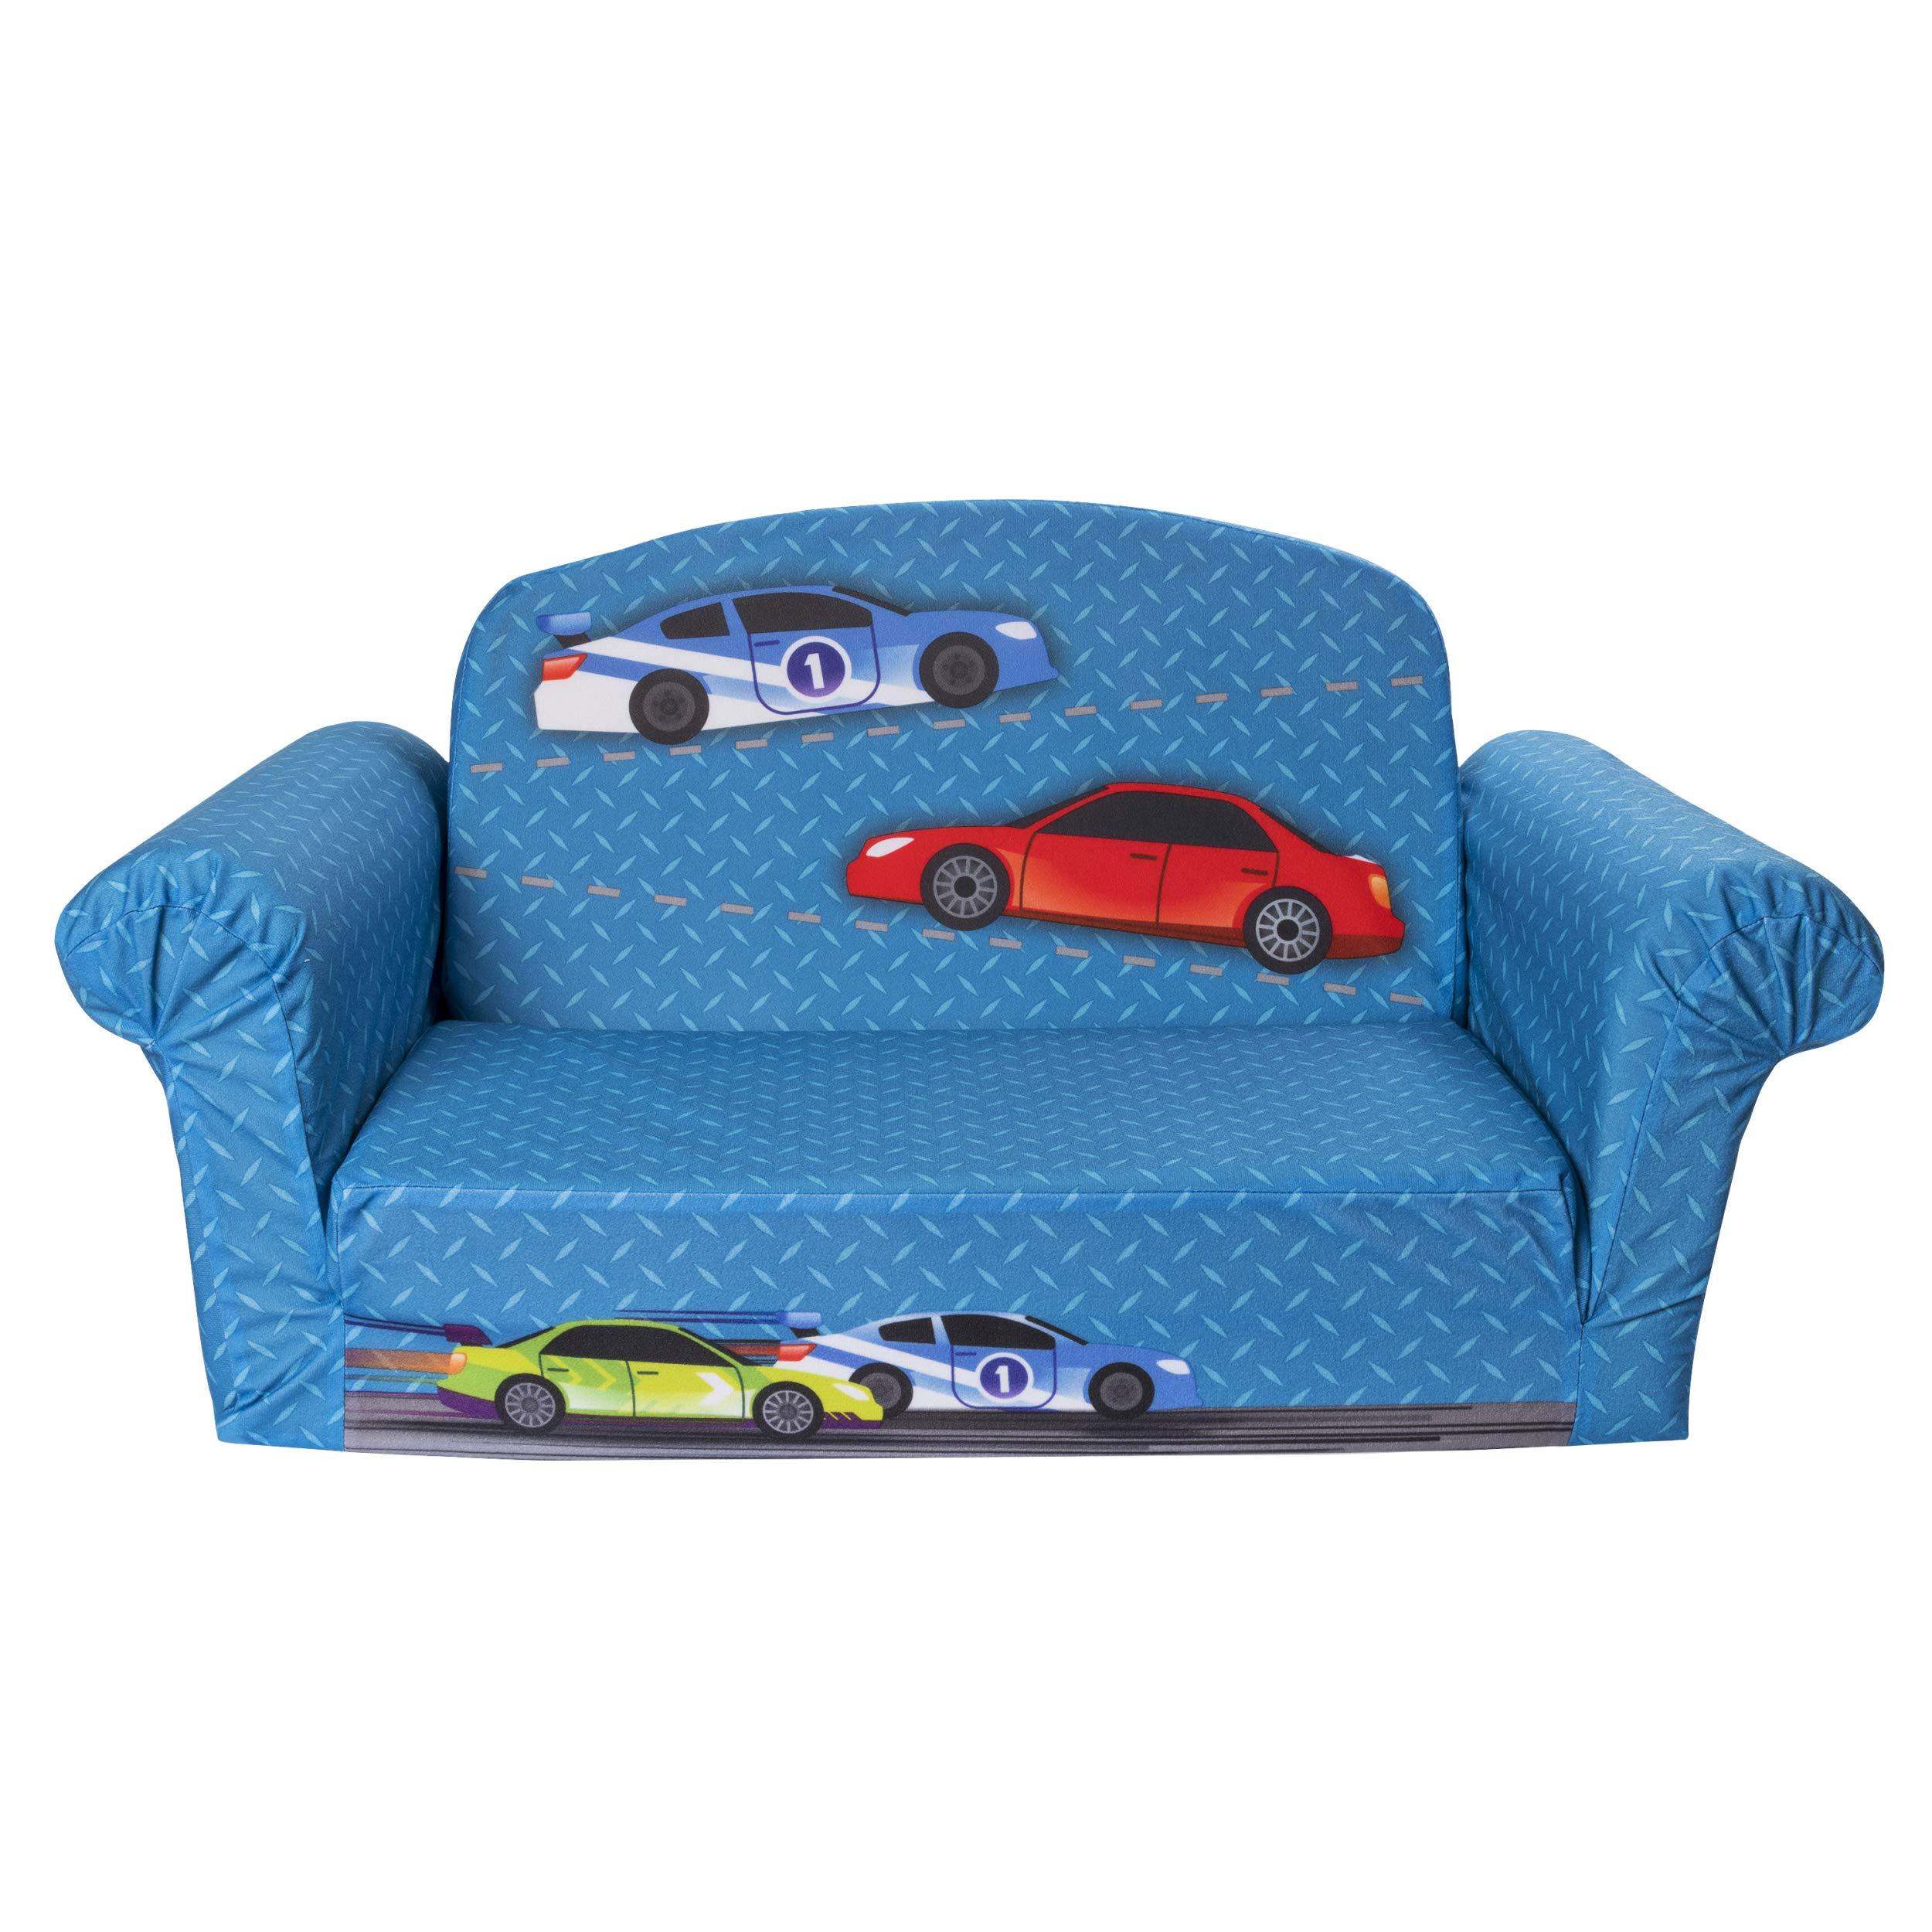 Marshmallow Furniture - Children's 2 in 1 Race Car Flip Open Foam Sofa by Marshmallow Furniture